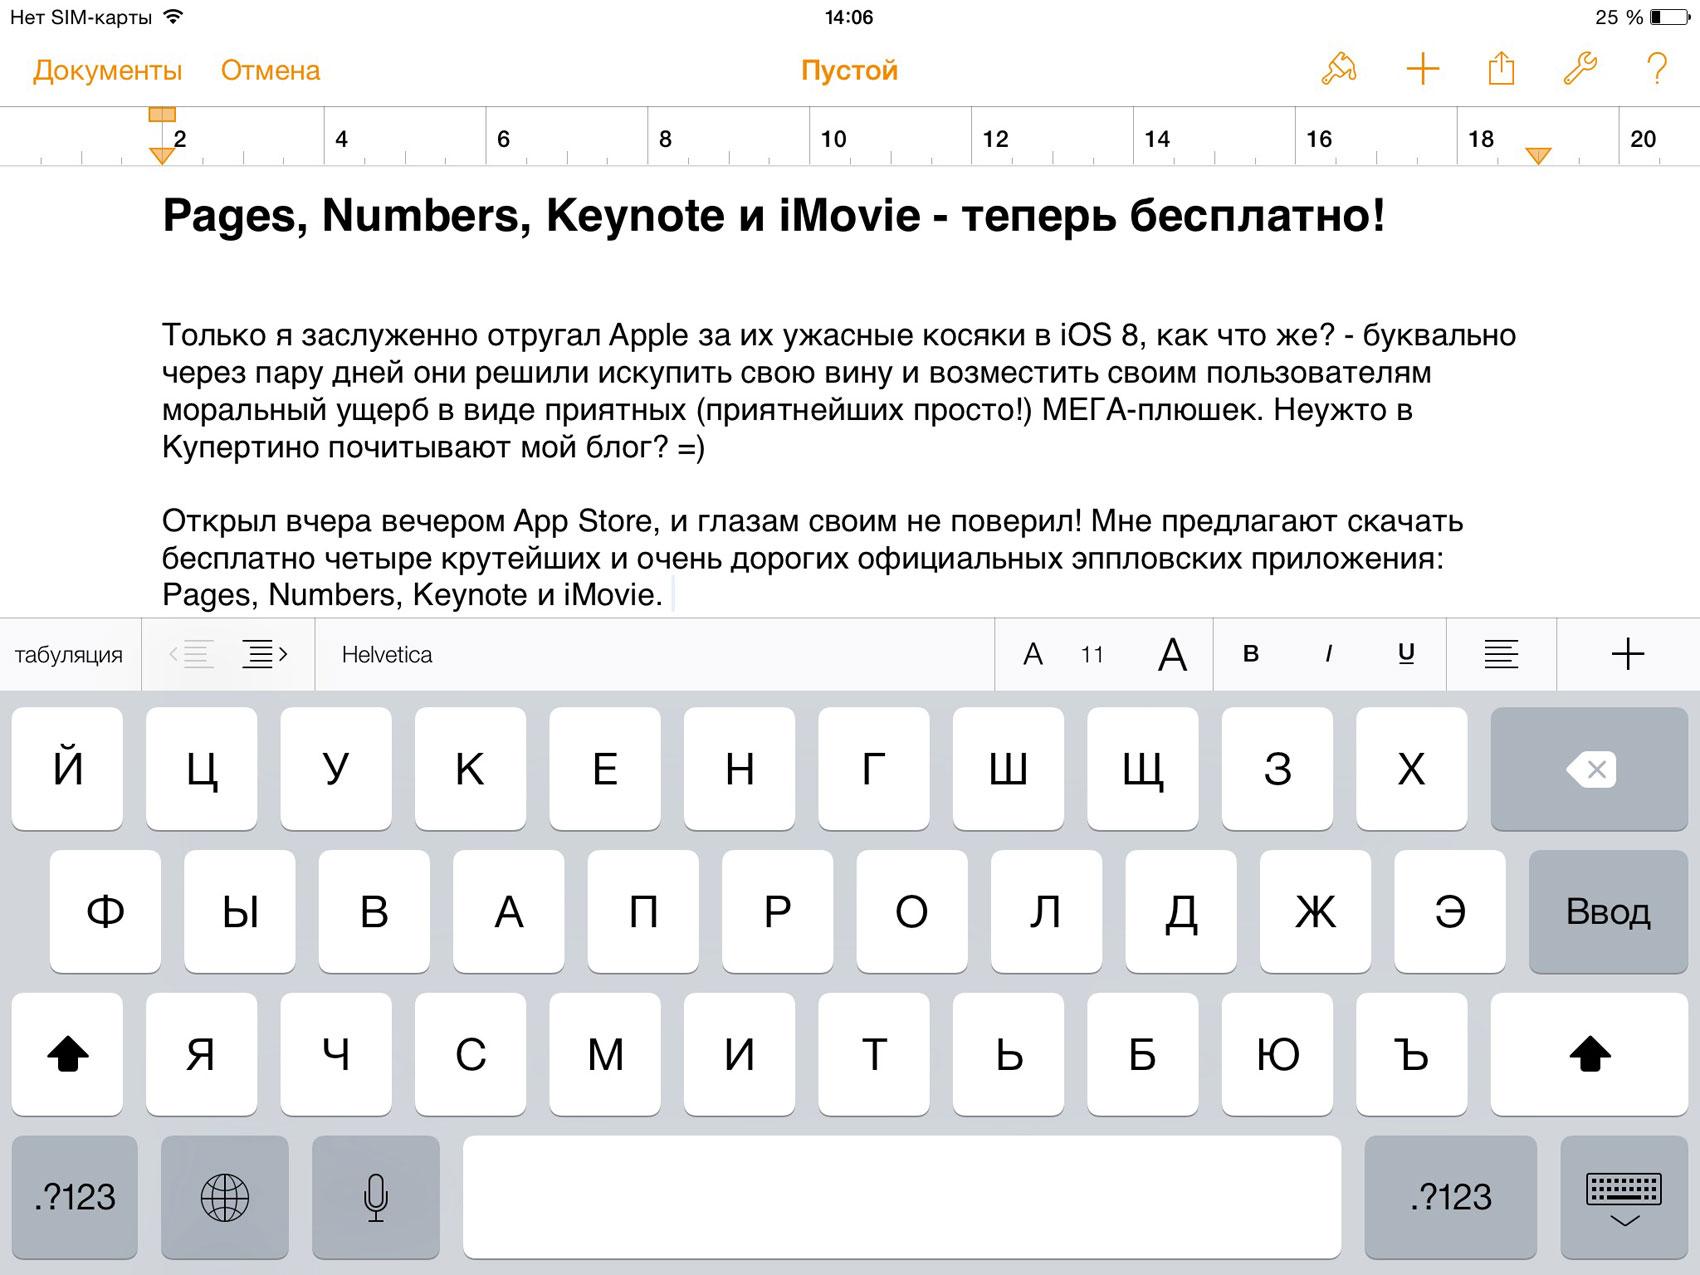 tekst-redaktor-pages